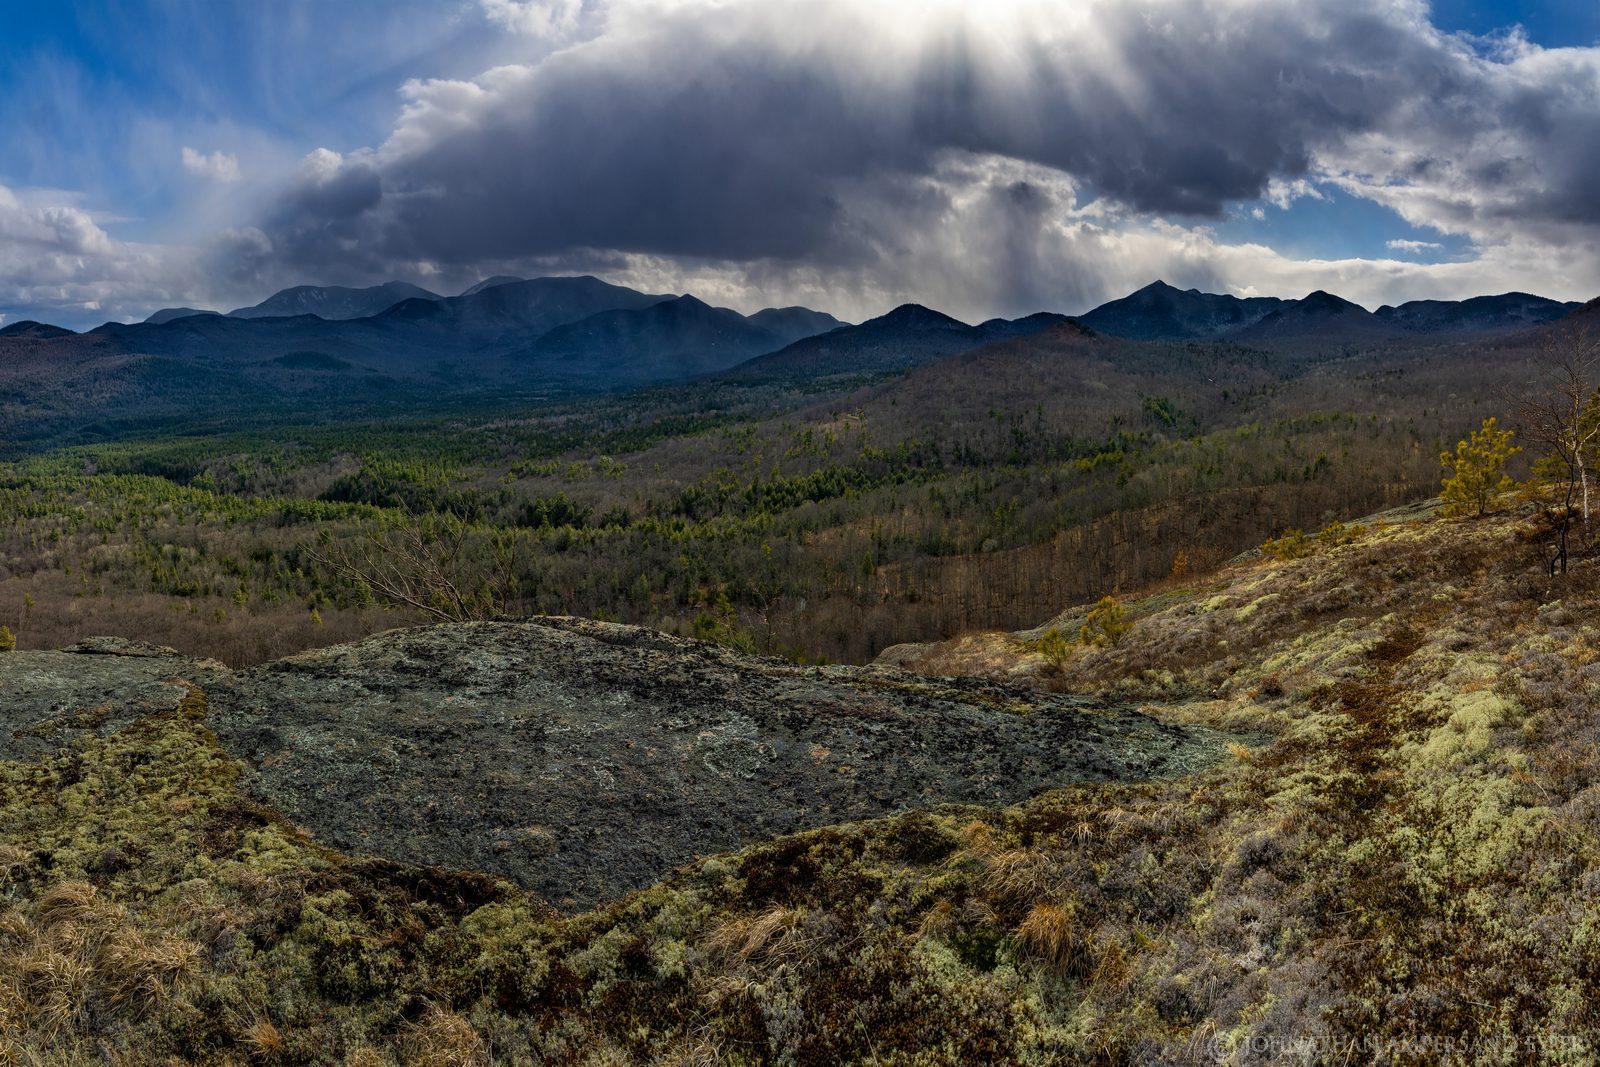 Blueberry Hills Trails,Blueberry Hill Trails,Blueberry Hill trail,Elizabethtown,Limekiln Mt,ledges,bushwhack,April,2020,Giant...